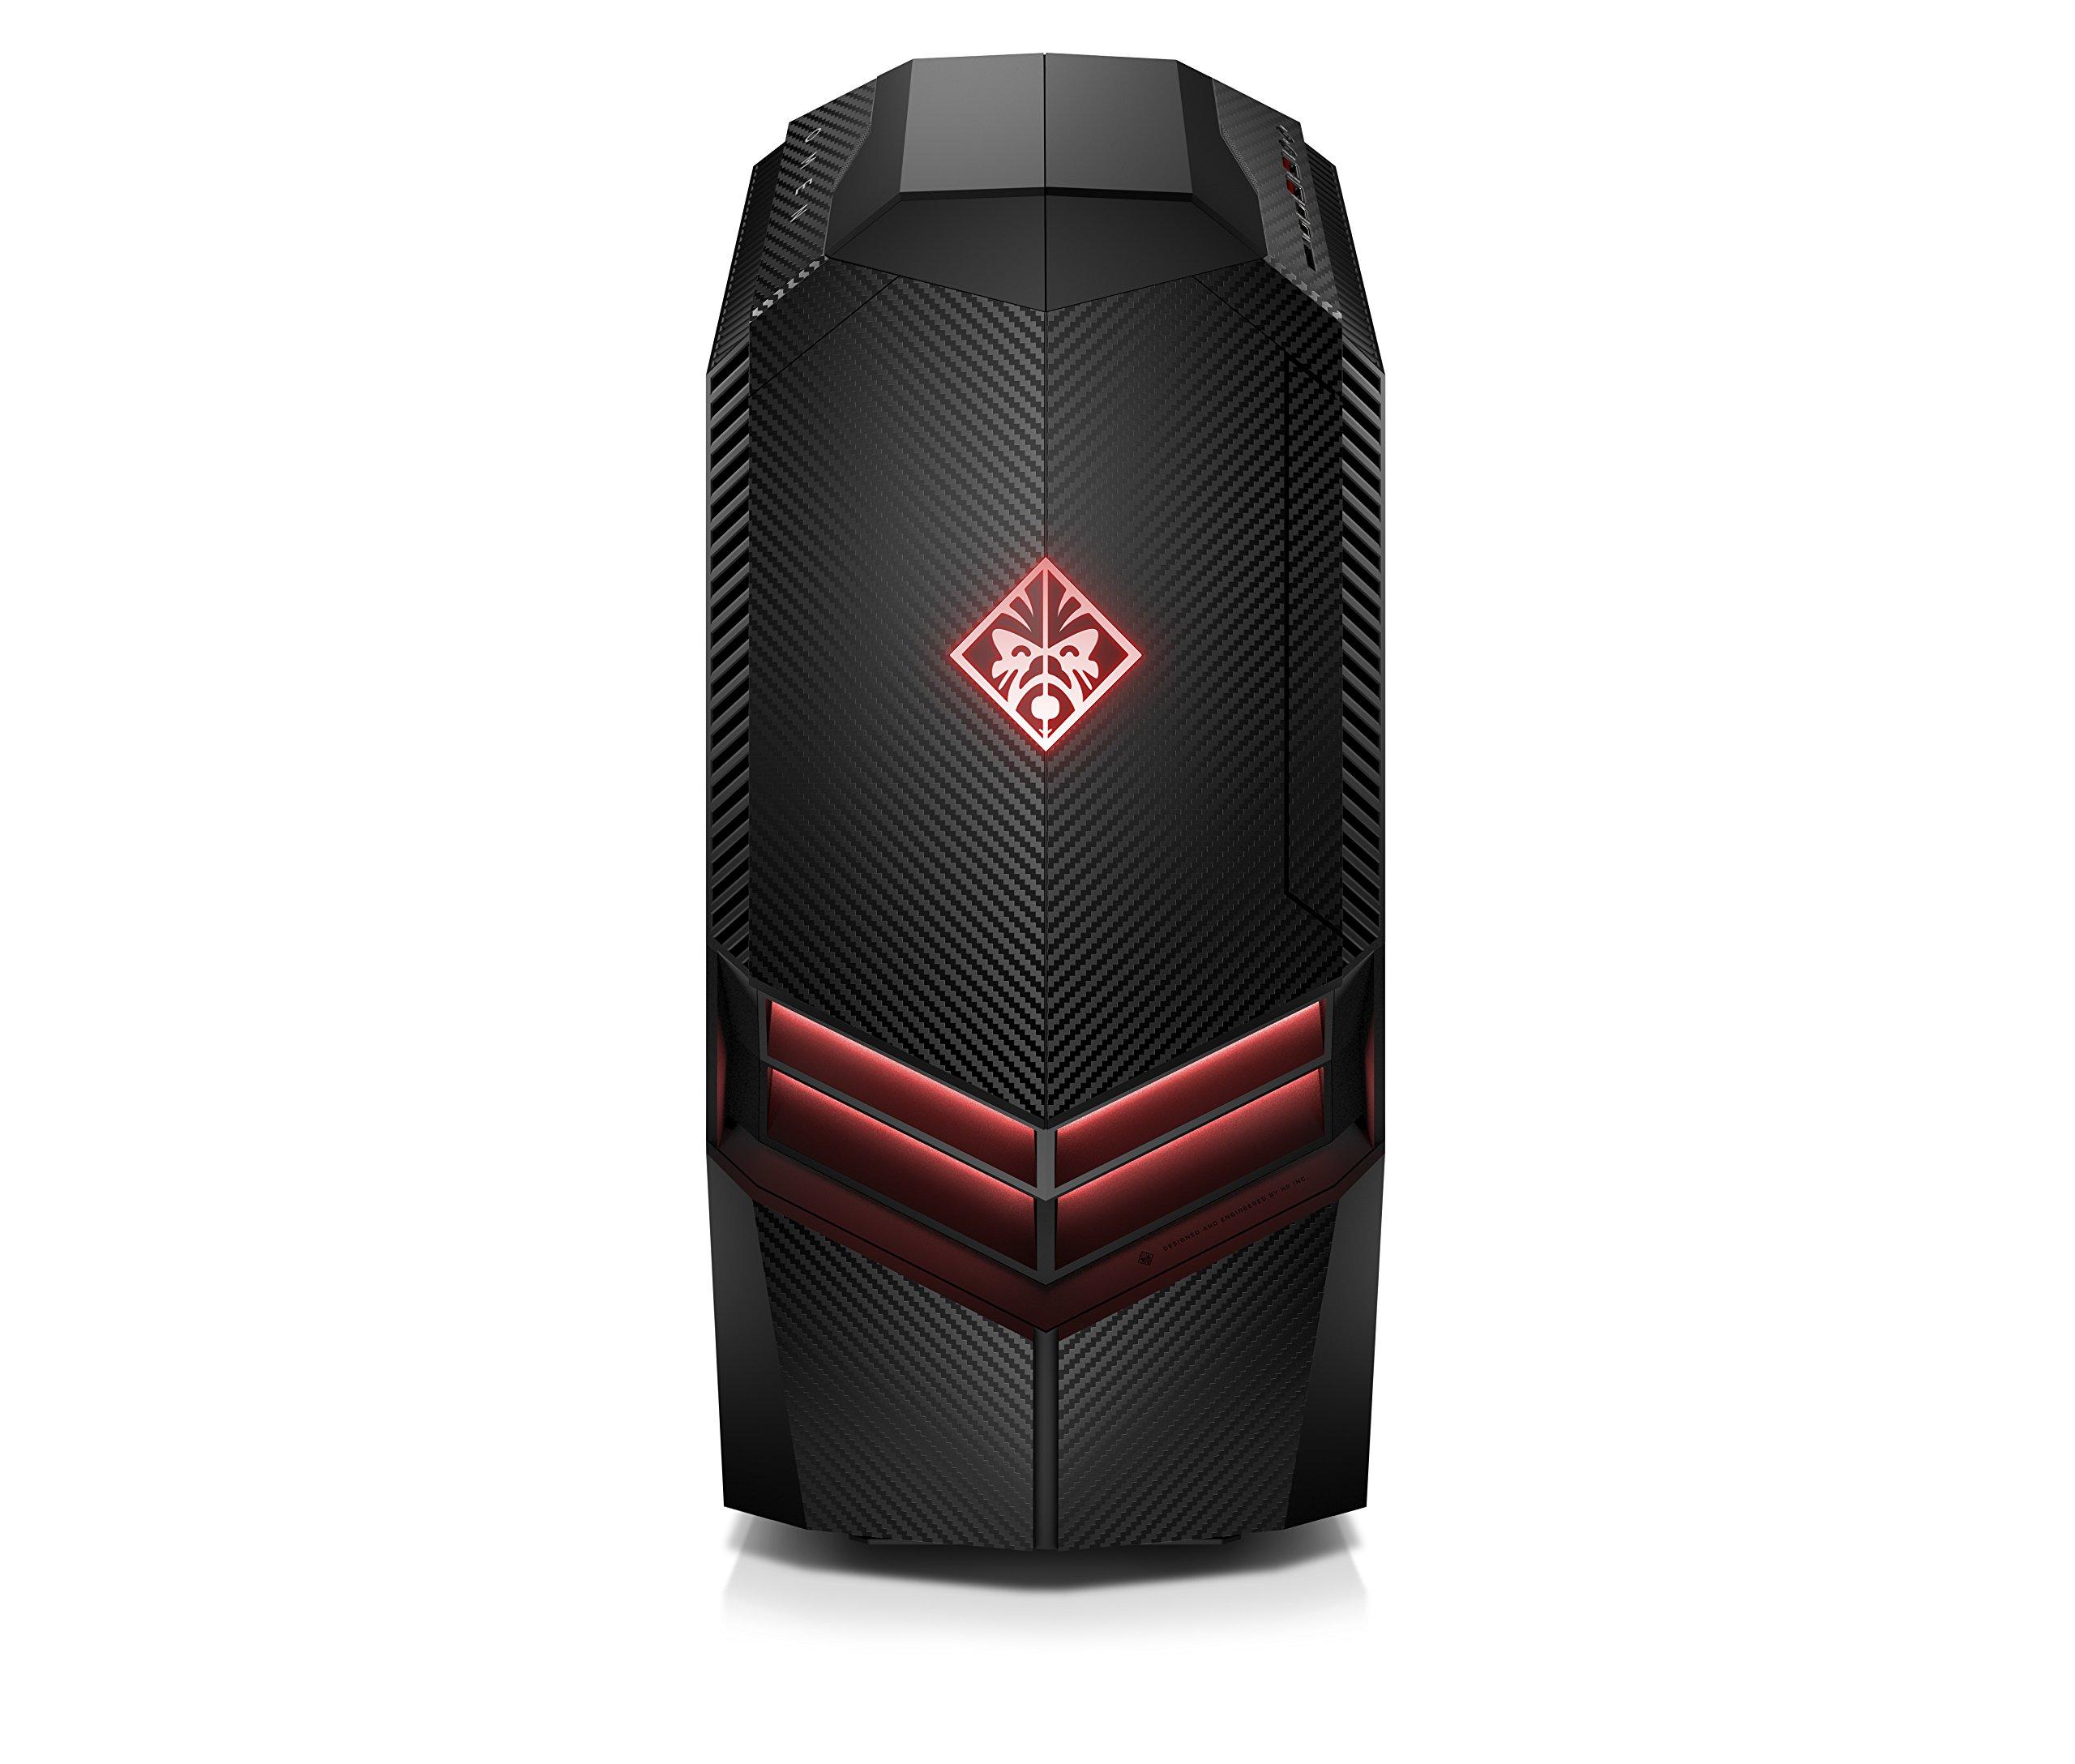 OMEN by HP Gaming Desktop Computer, Intel Core i7-8700K Processor, NVIDIA GeForce RTX 2080 8 GB, 16 GB RAM, 2 TB hard drive, 512 GB SSD, Windows 10 Home (880-180, Black) by HP